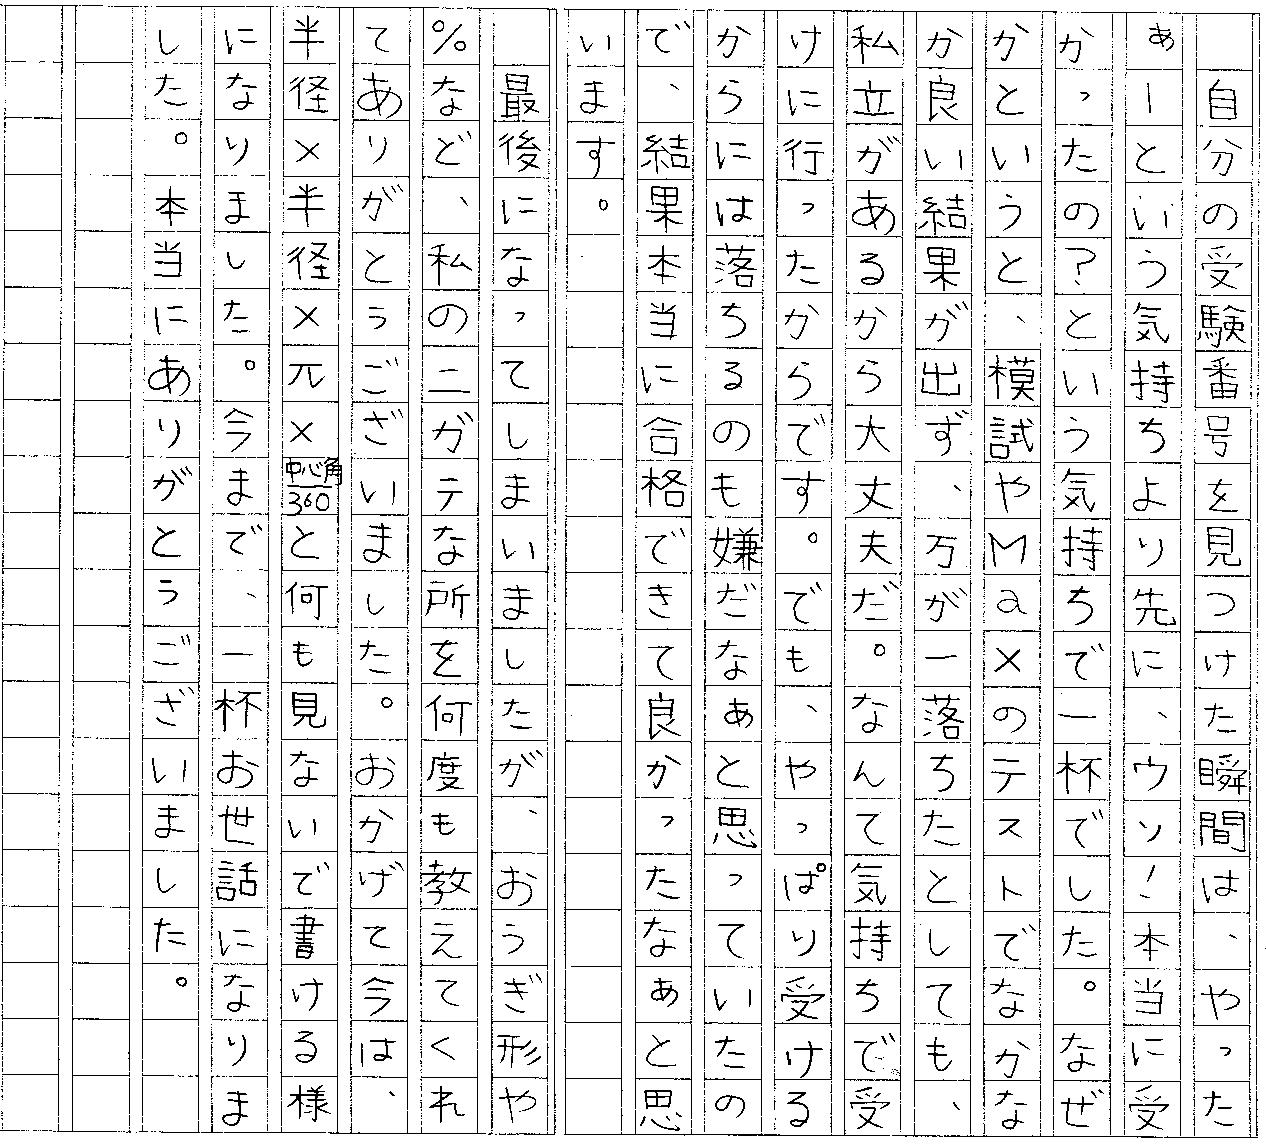 368-1